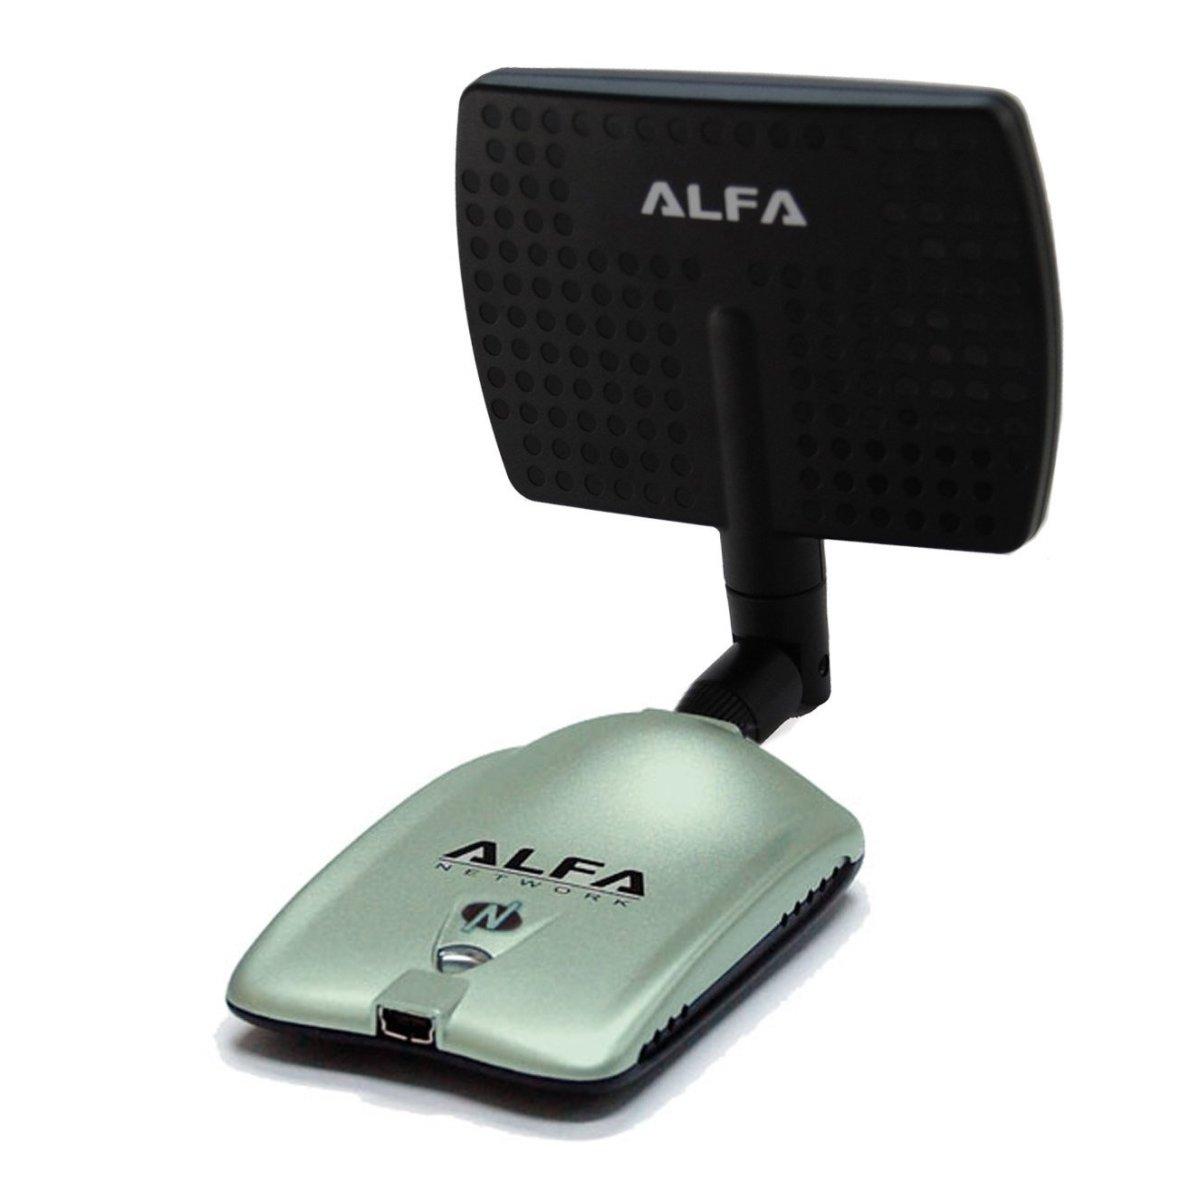 The Alfa AWUS036NH 2000mW with 7dbi flat panel antenna